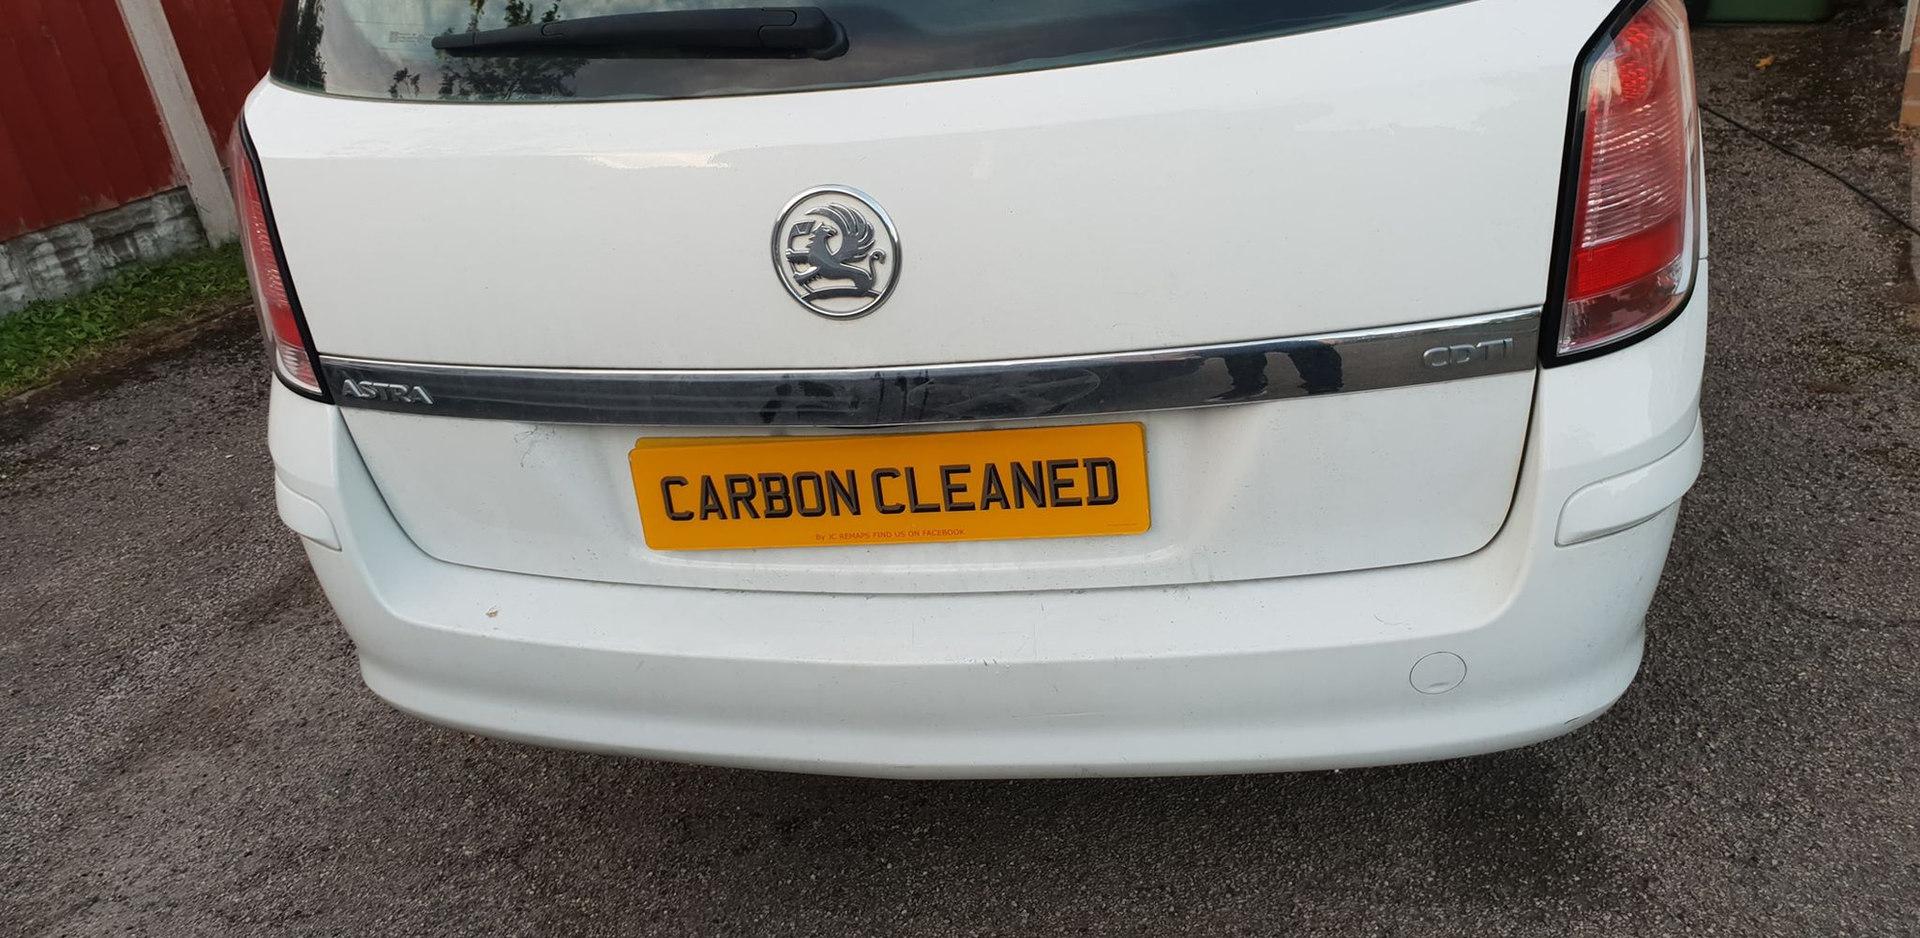 43047914_2238990666333364_89207302587185Car - Remap - BHP - Power - Fuel - Carbon Cleaning - ECU - TDI - Tuning - JCRemaps - 118